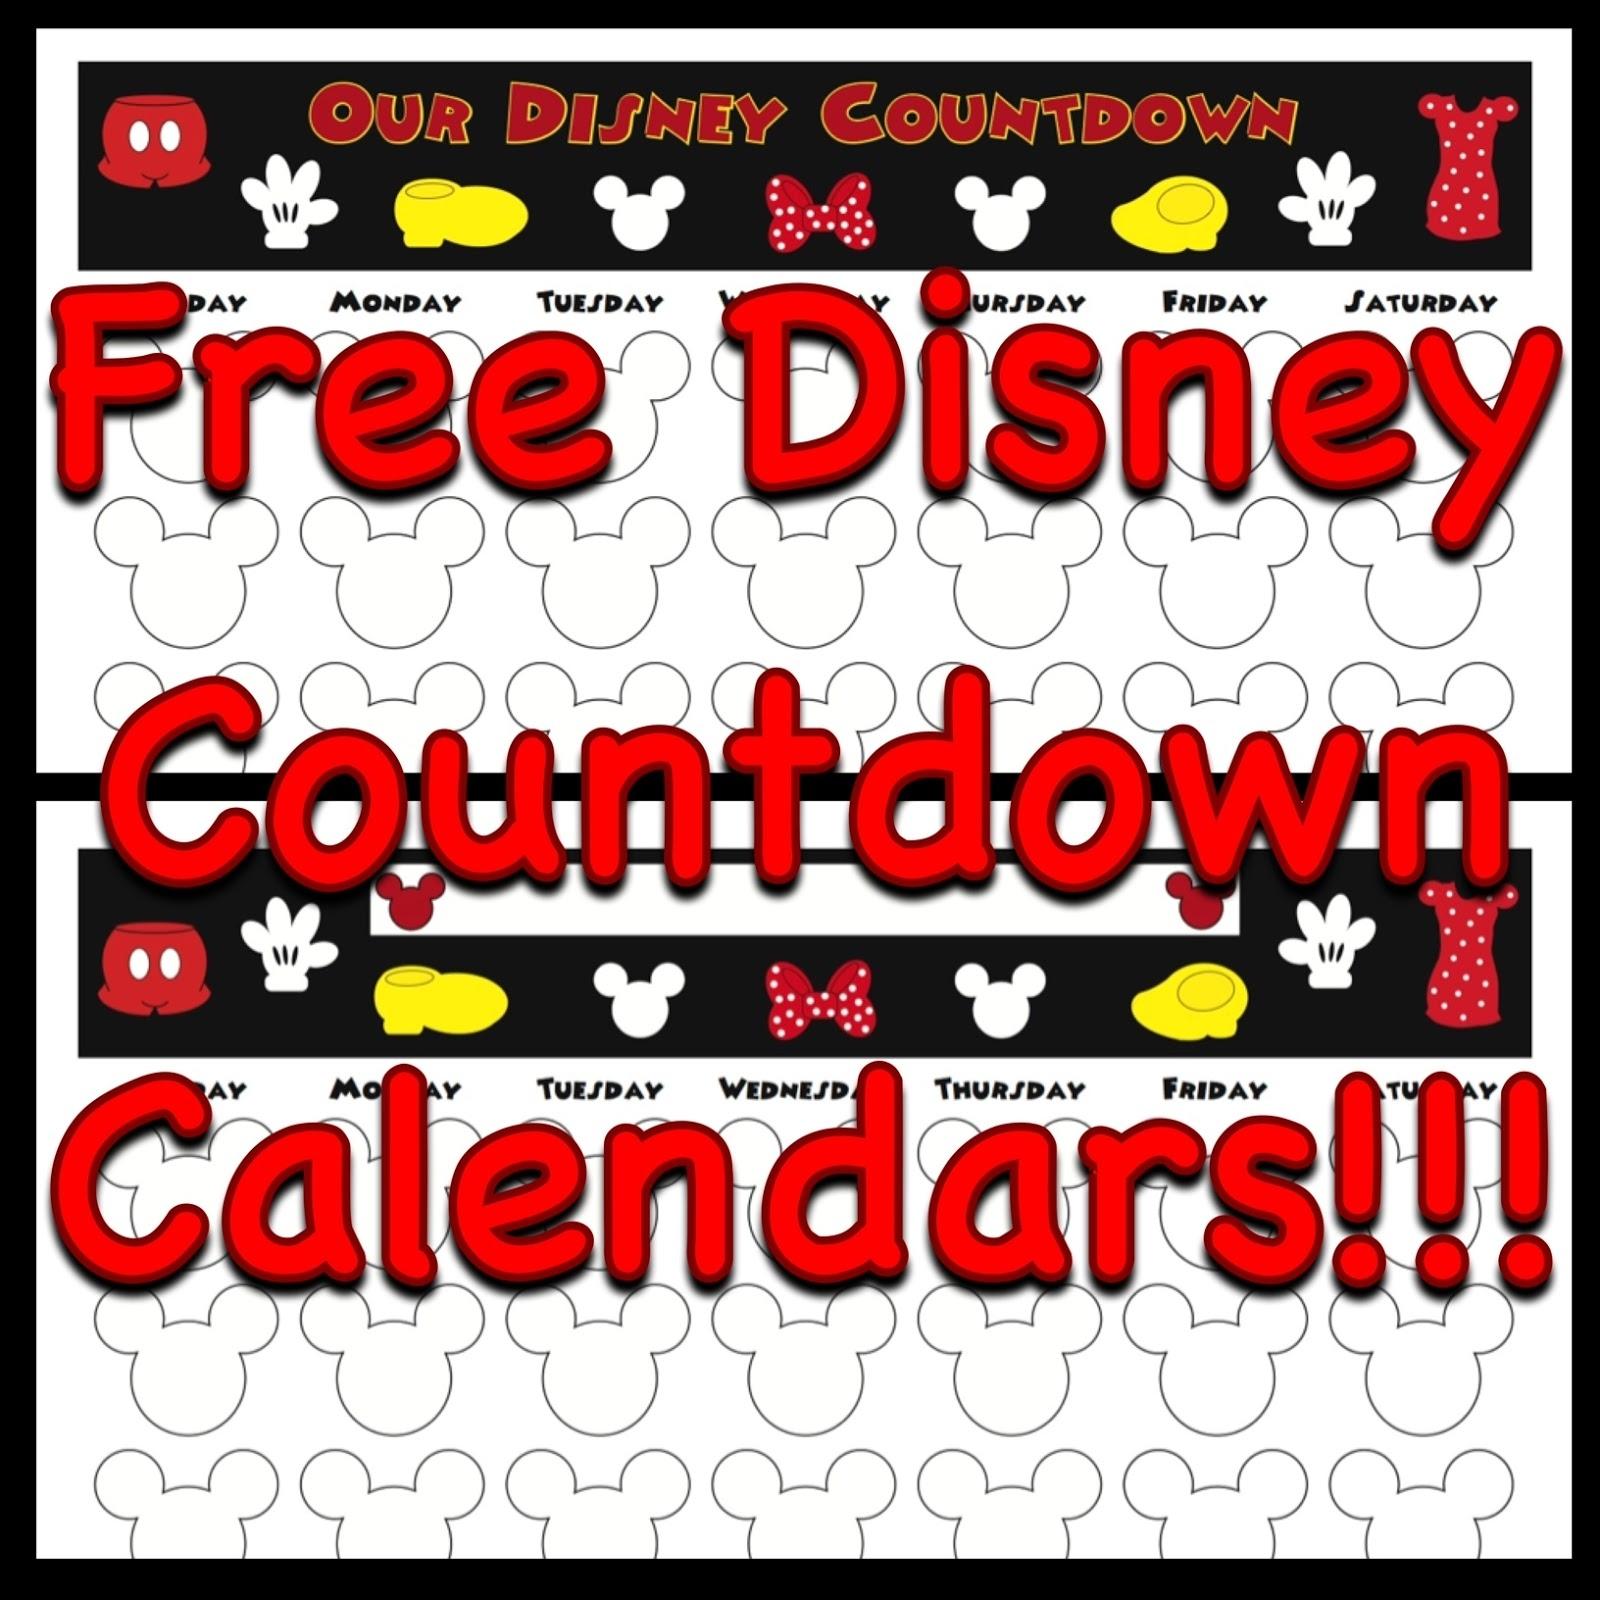 My Disney Life: Countdown Calendars regarding Disney Cruise Countdown Calendar Printable